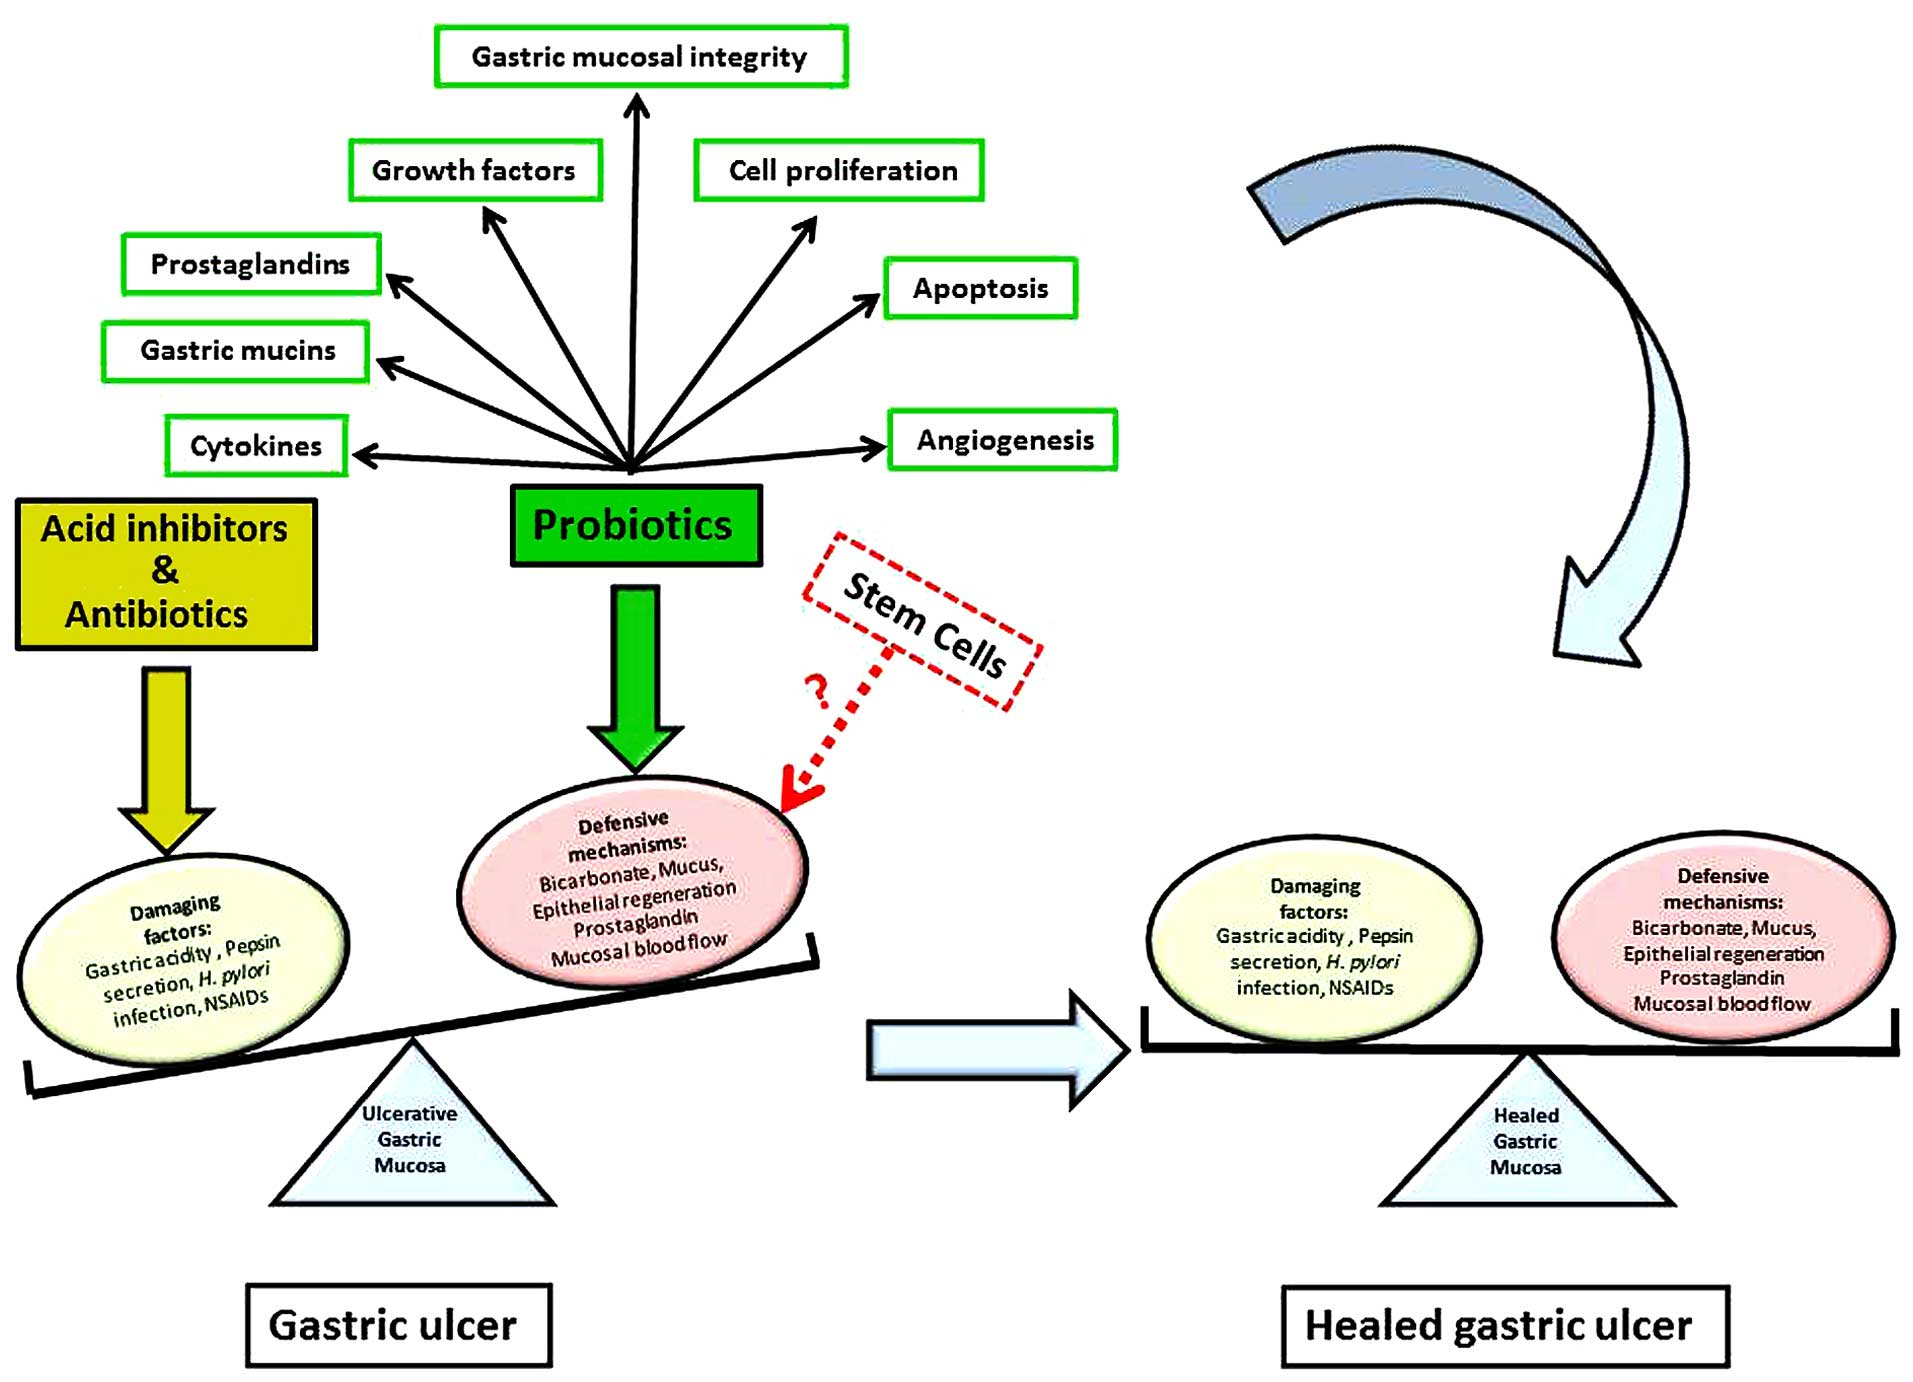 steroidal vs nonsteroidal aromatase inhibitors